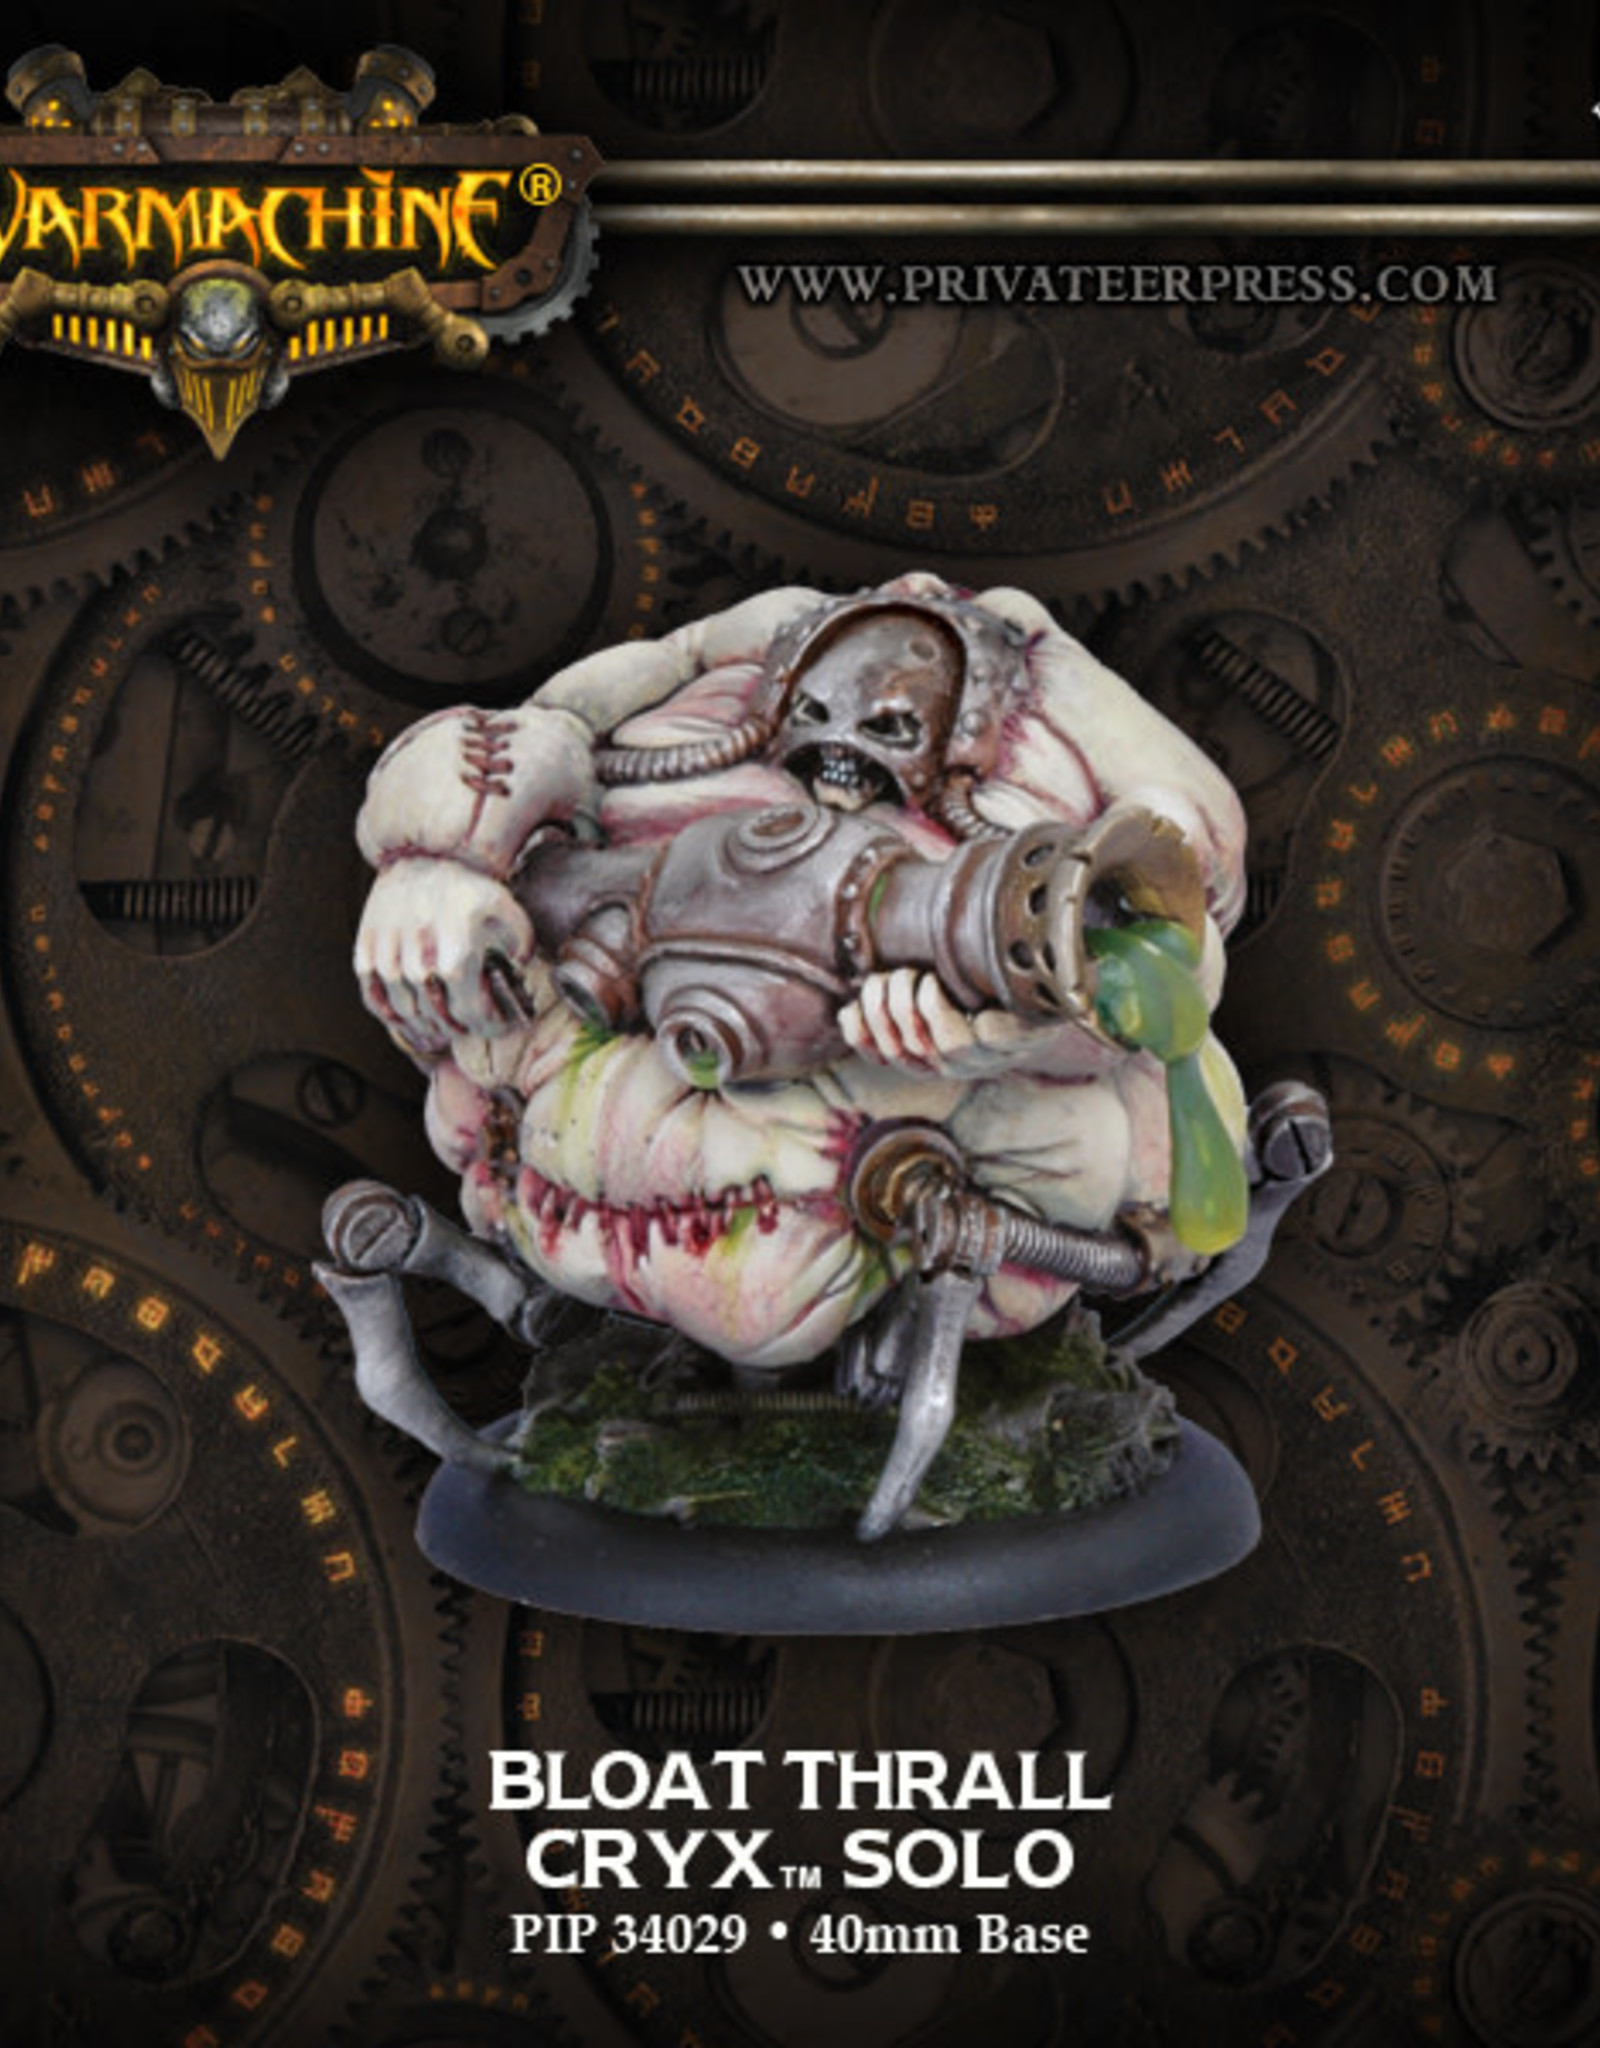 Warmachine Cryx - Bloat Thrall